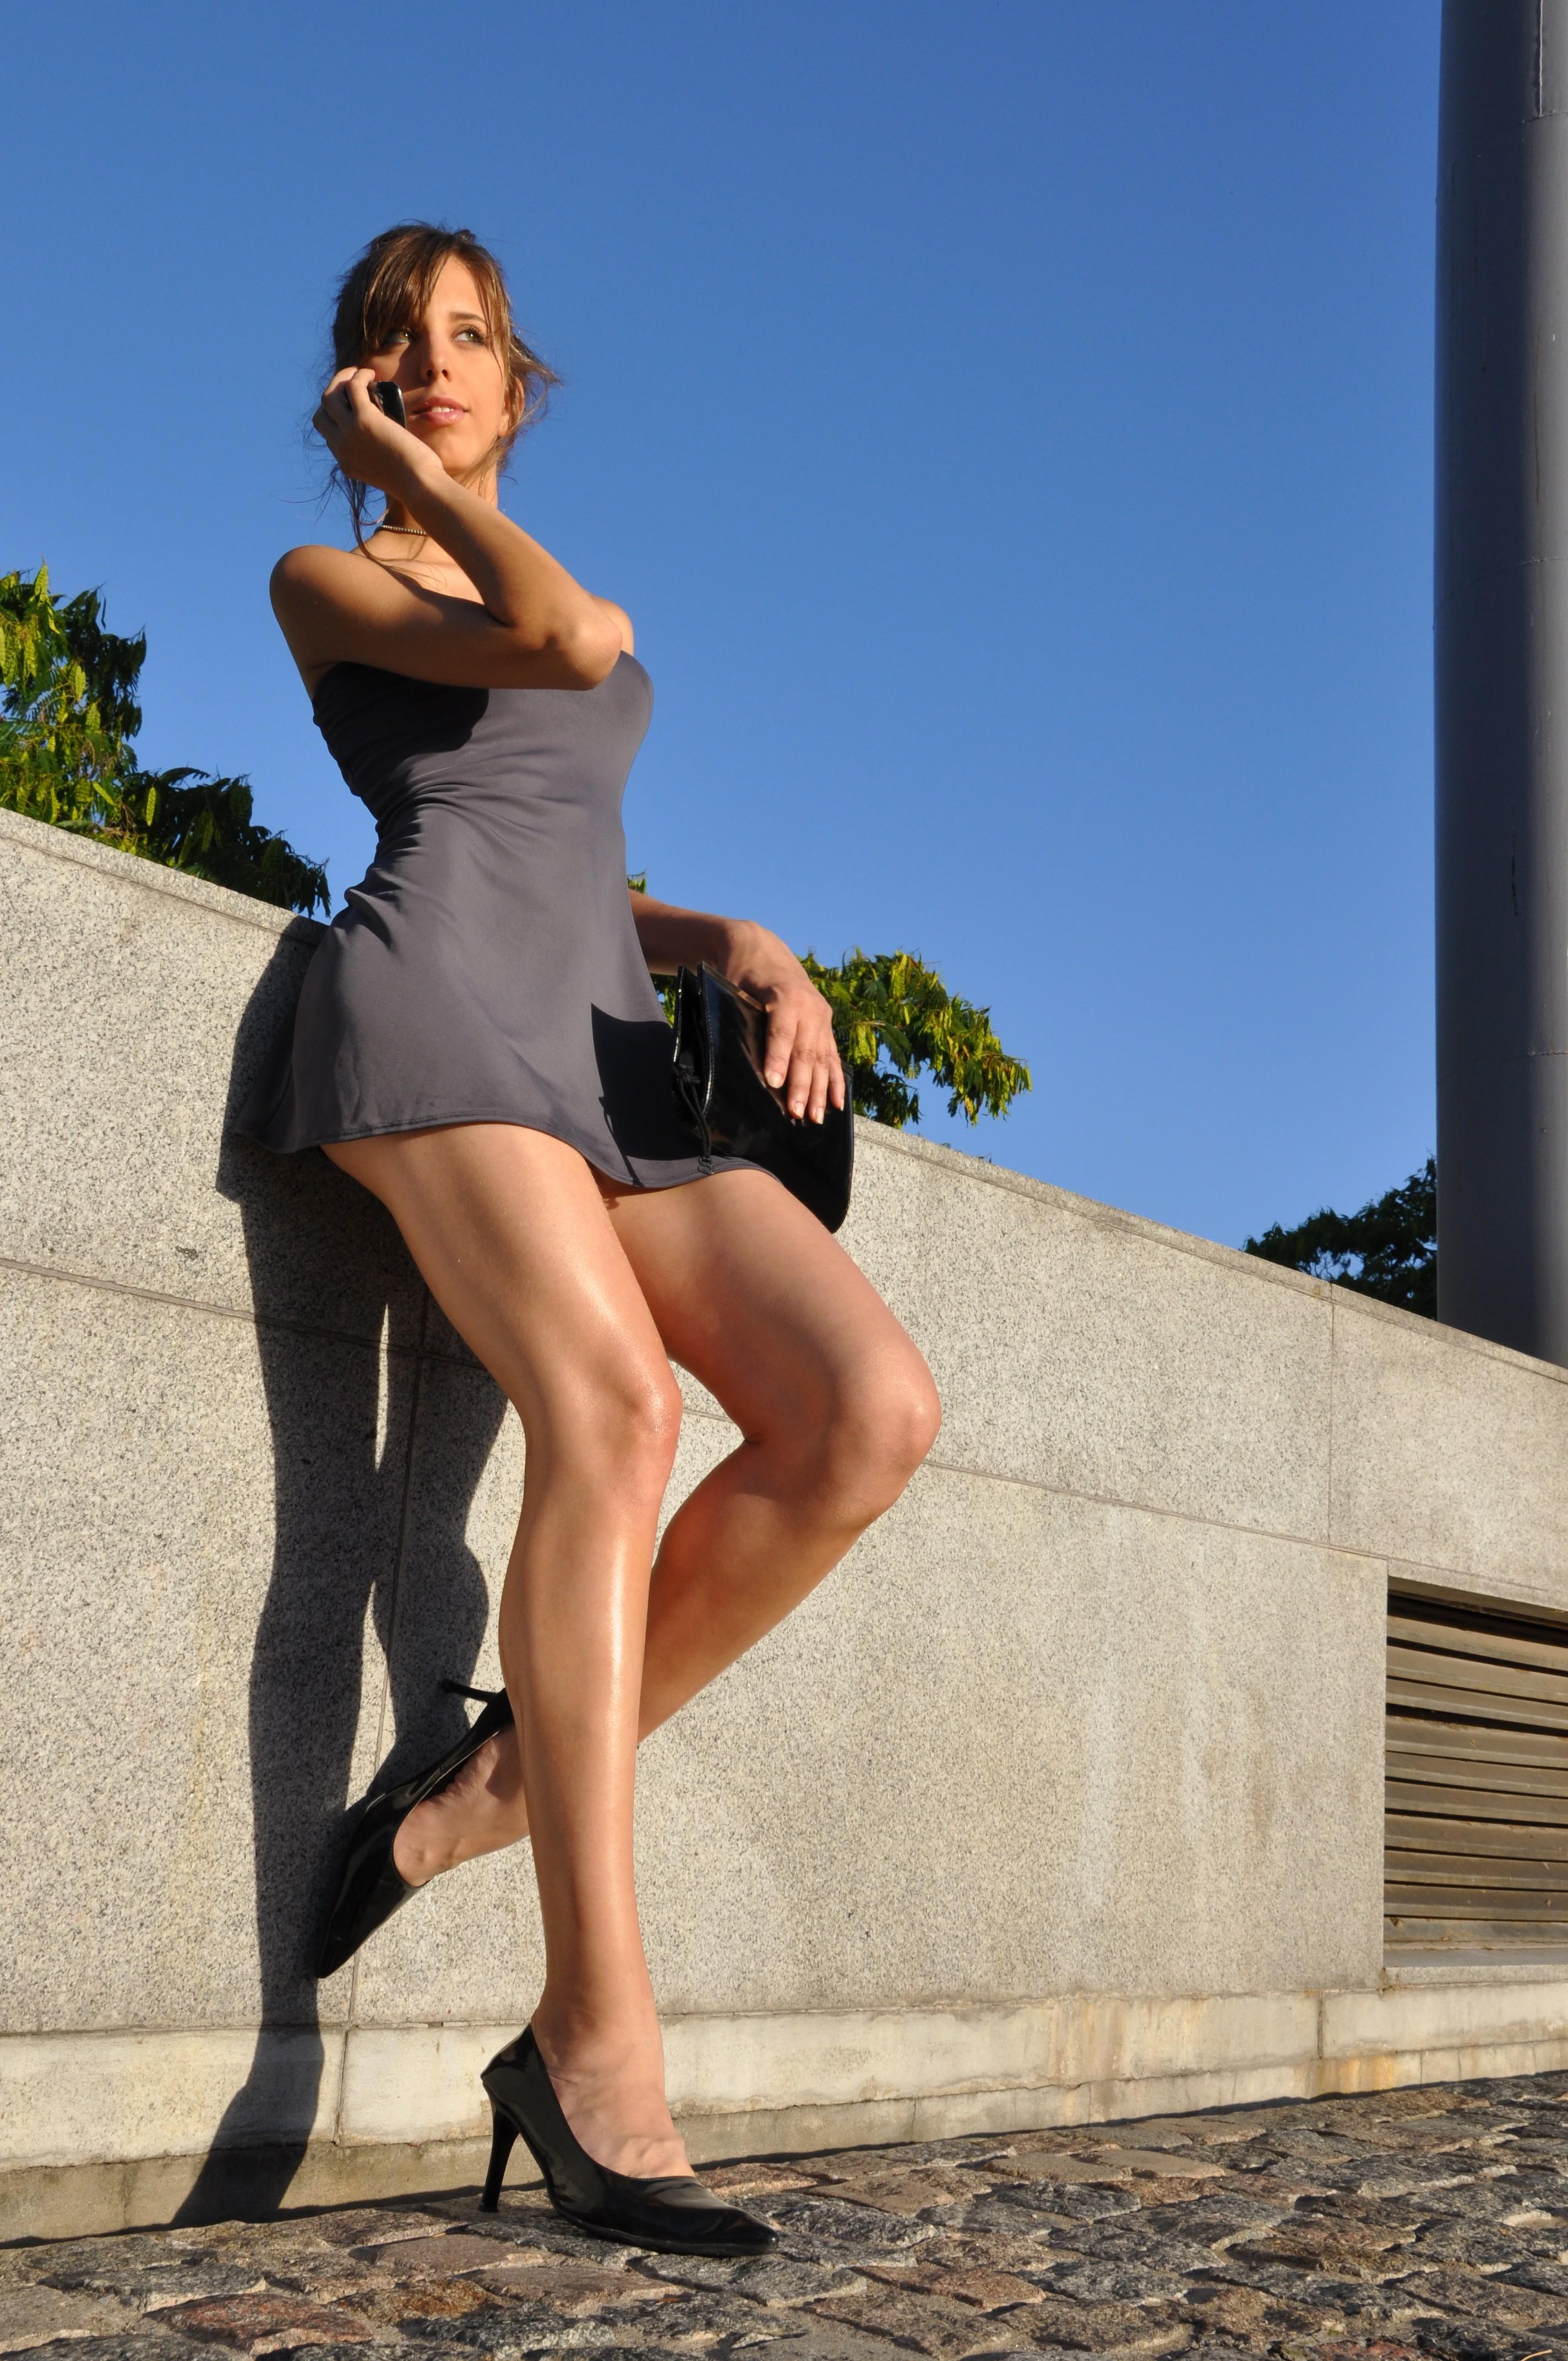 приготовим фото мини юбки сидеть нога на ногу история